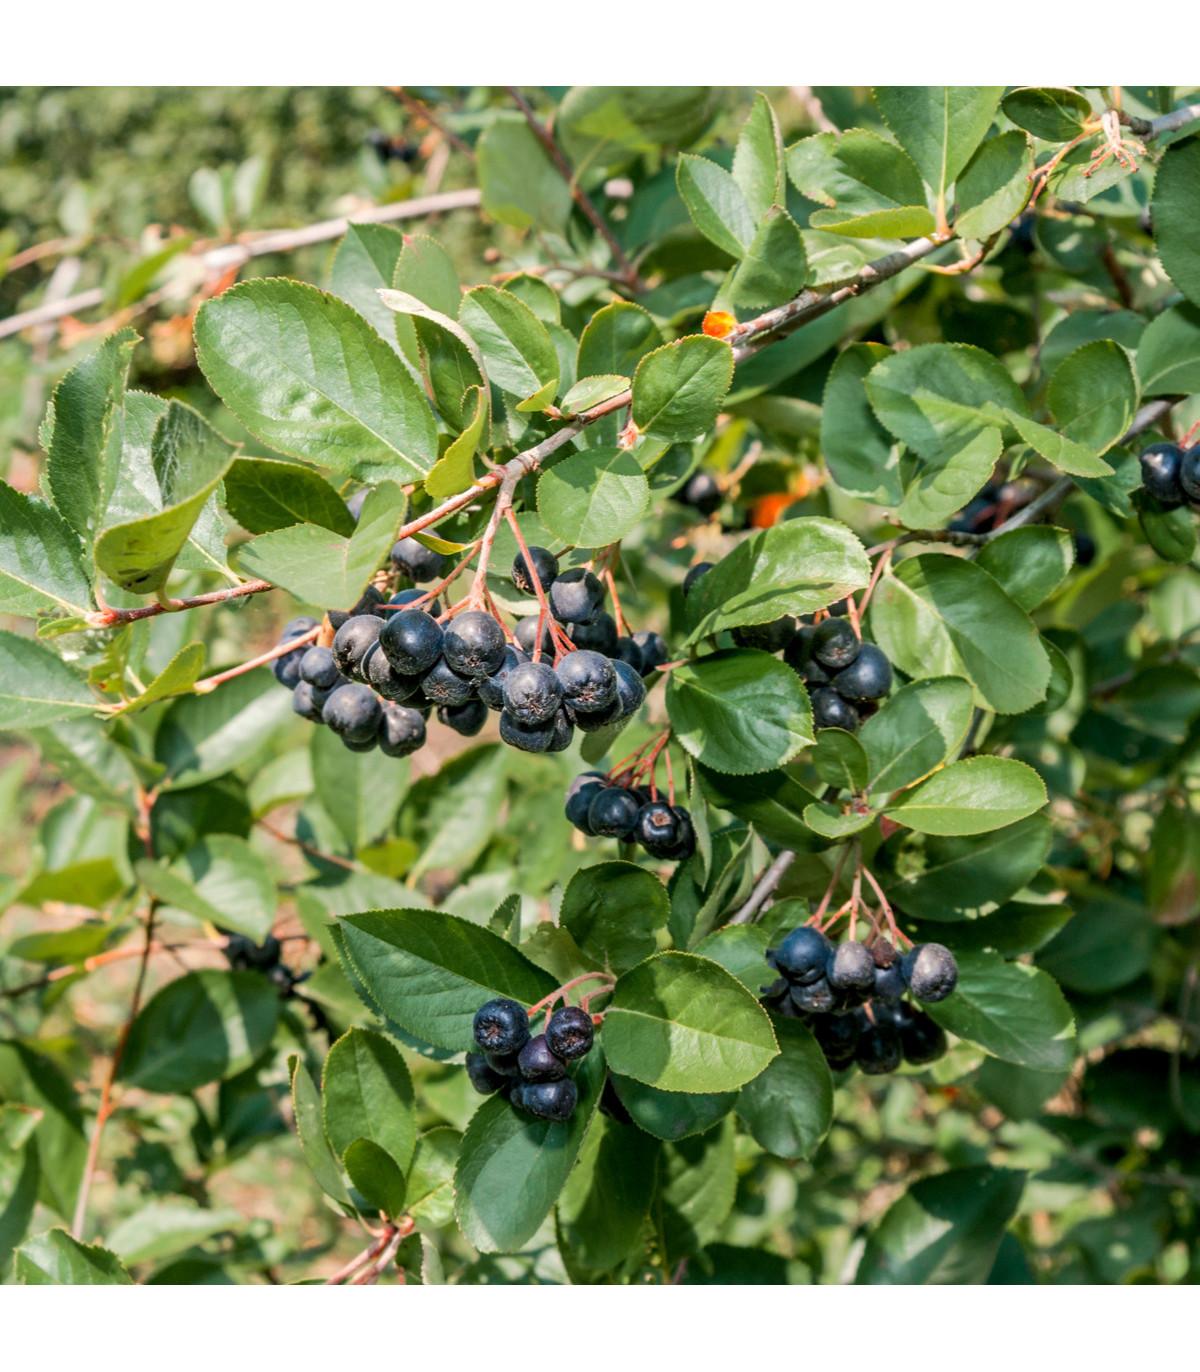 Aronie - Černý jeřáb - Aronia melanocarpa - prodej semen- 7 ks